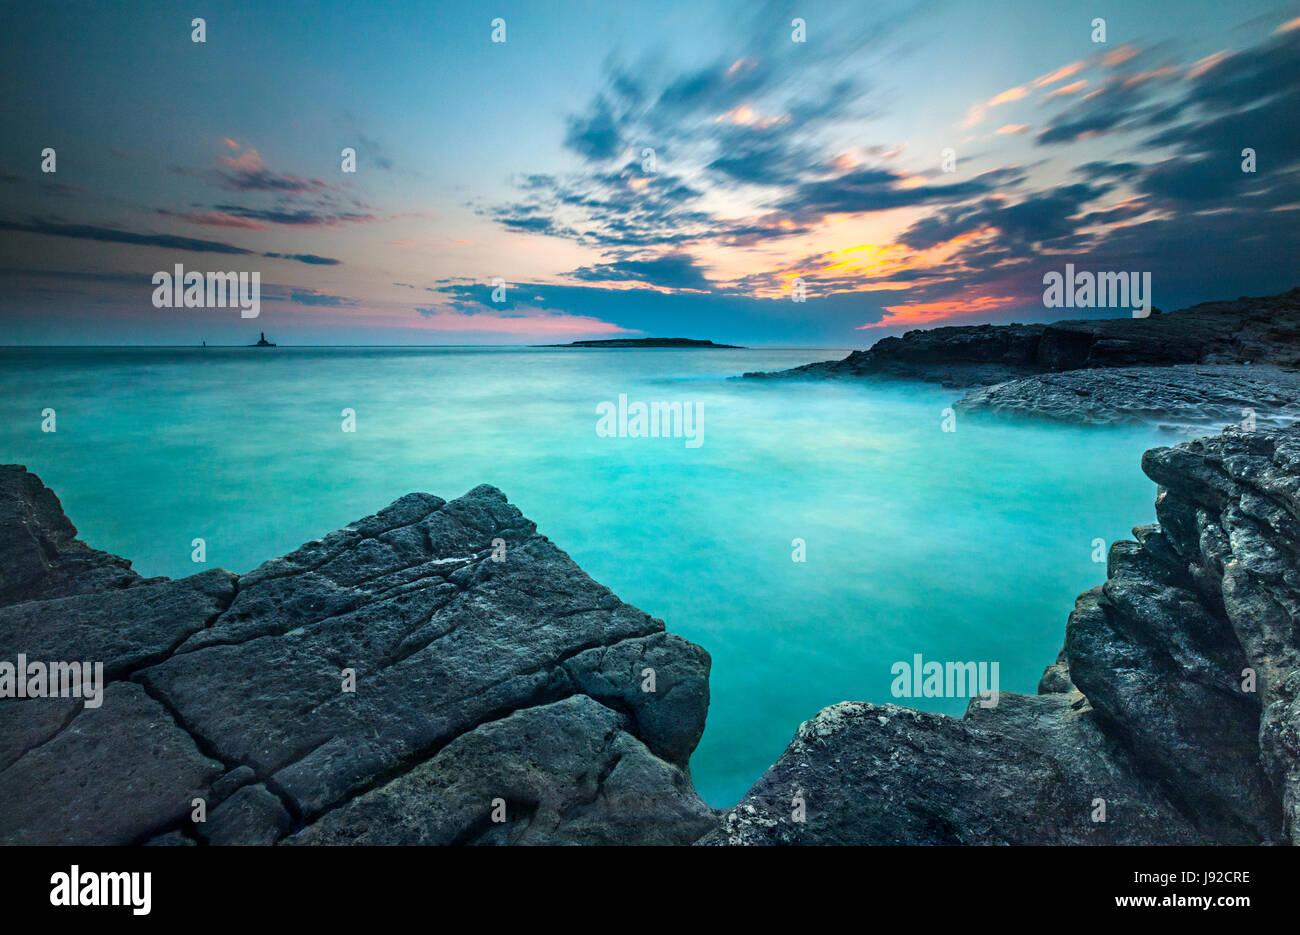 Sunset landscape in Istria. Rt kamenjak, Premantura. - Stock Image